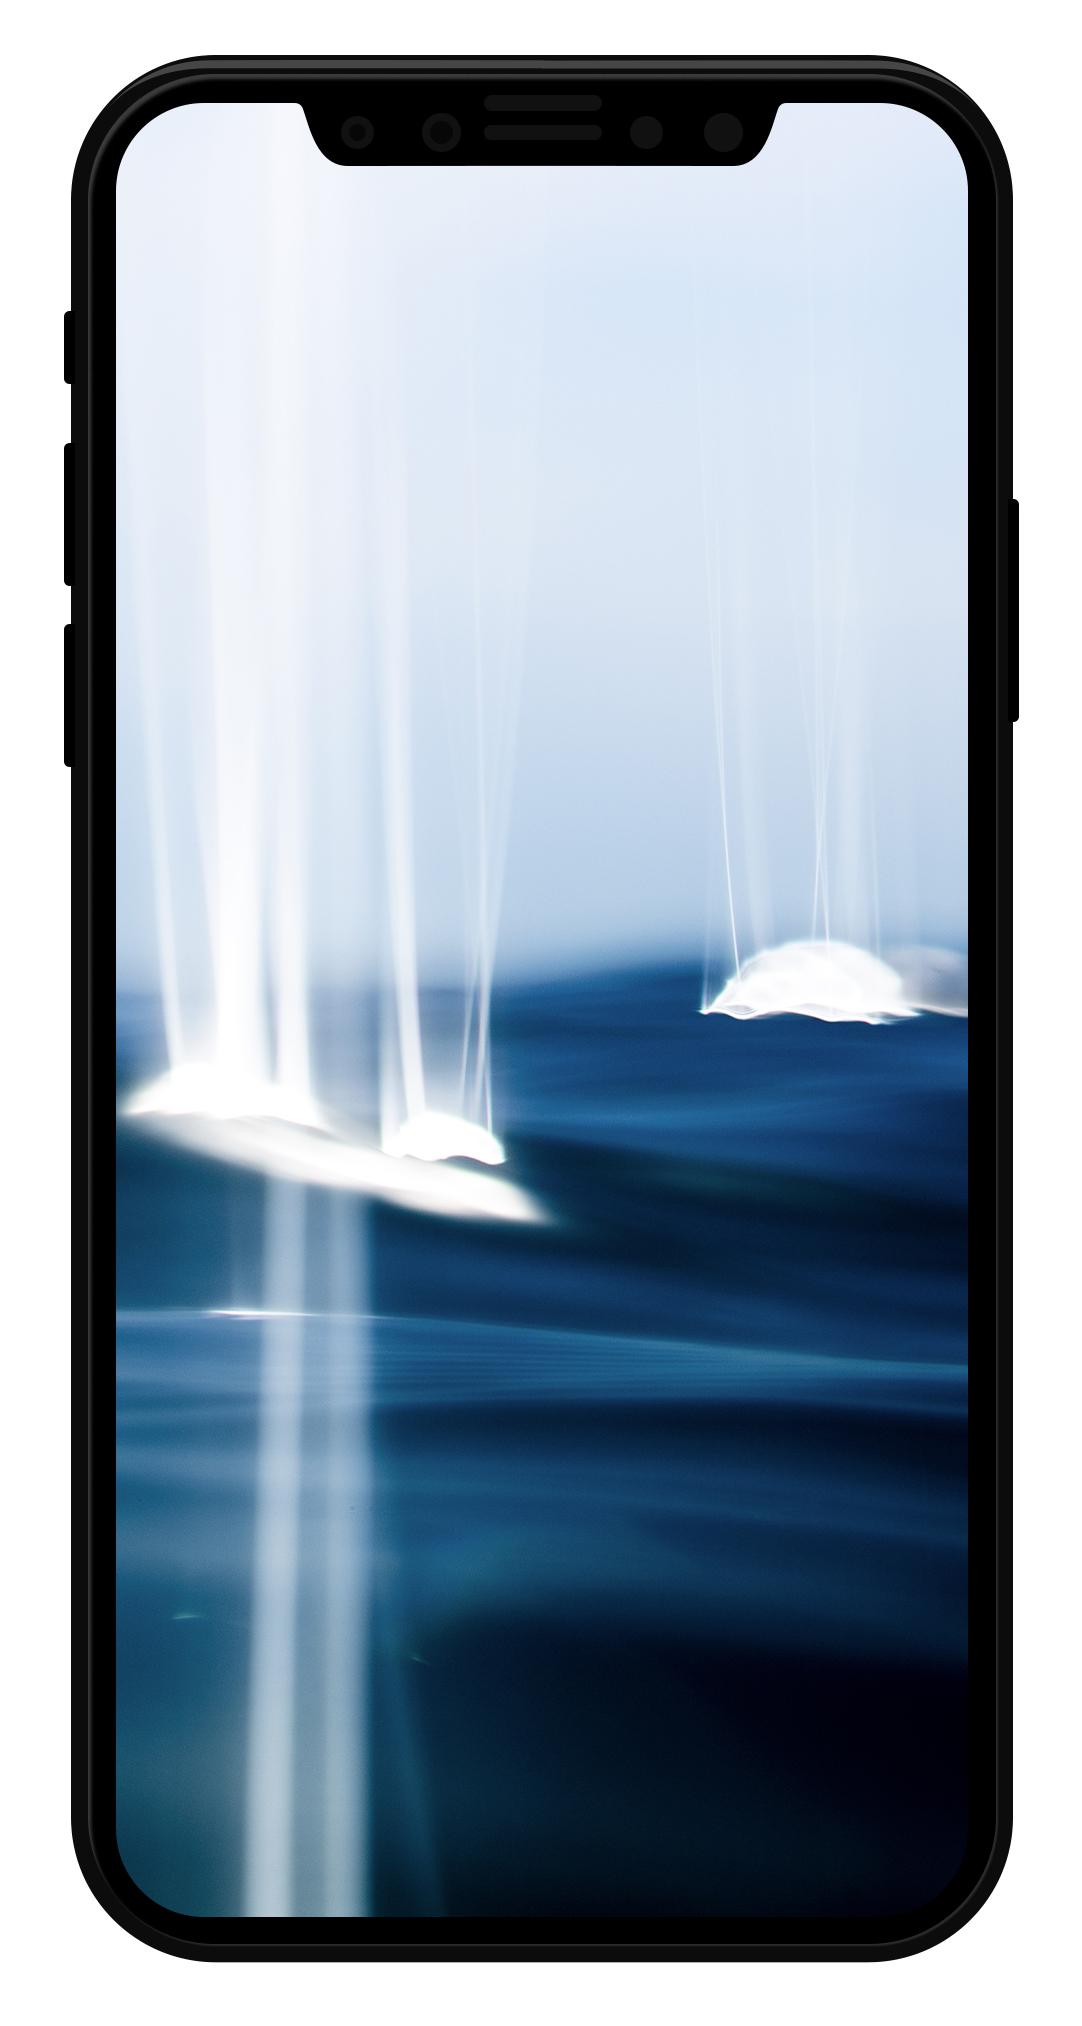 iphone-8-mockup-downloadablhfe.jpg